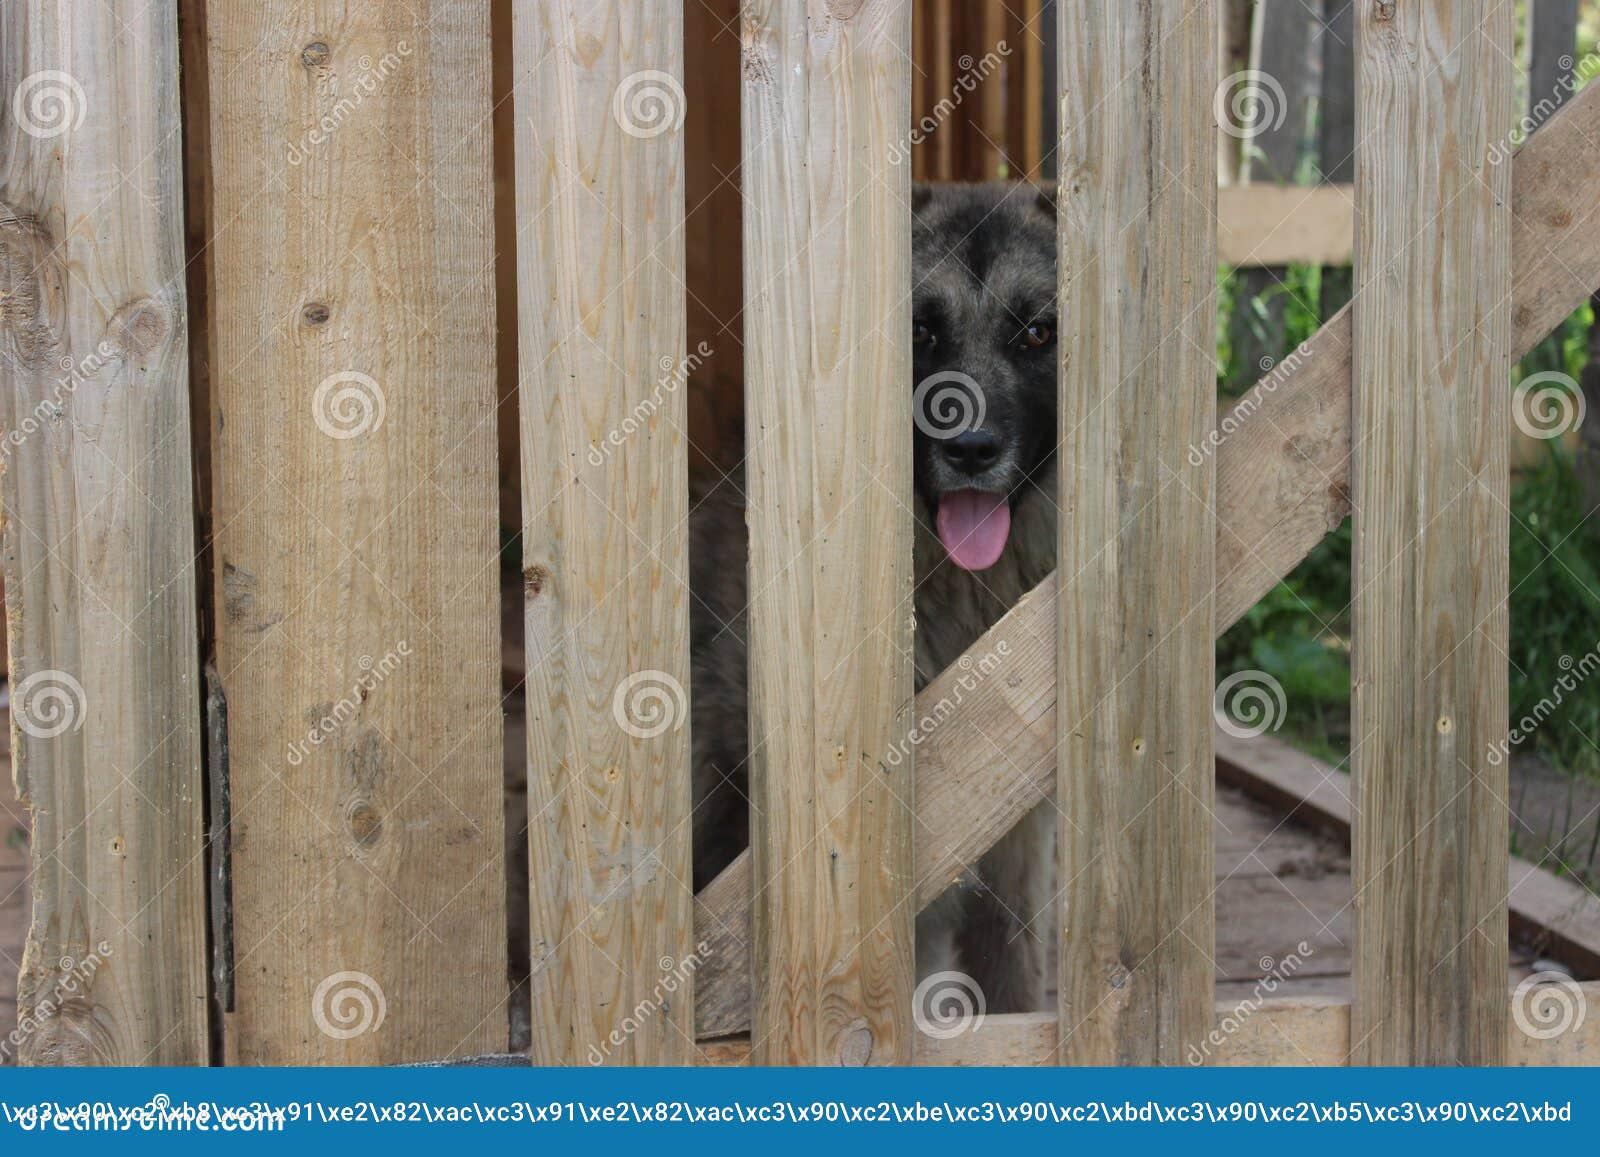 Staket hundstaket : Bak Hundstaket Arkivfoto - Bild: 78737787